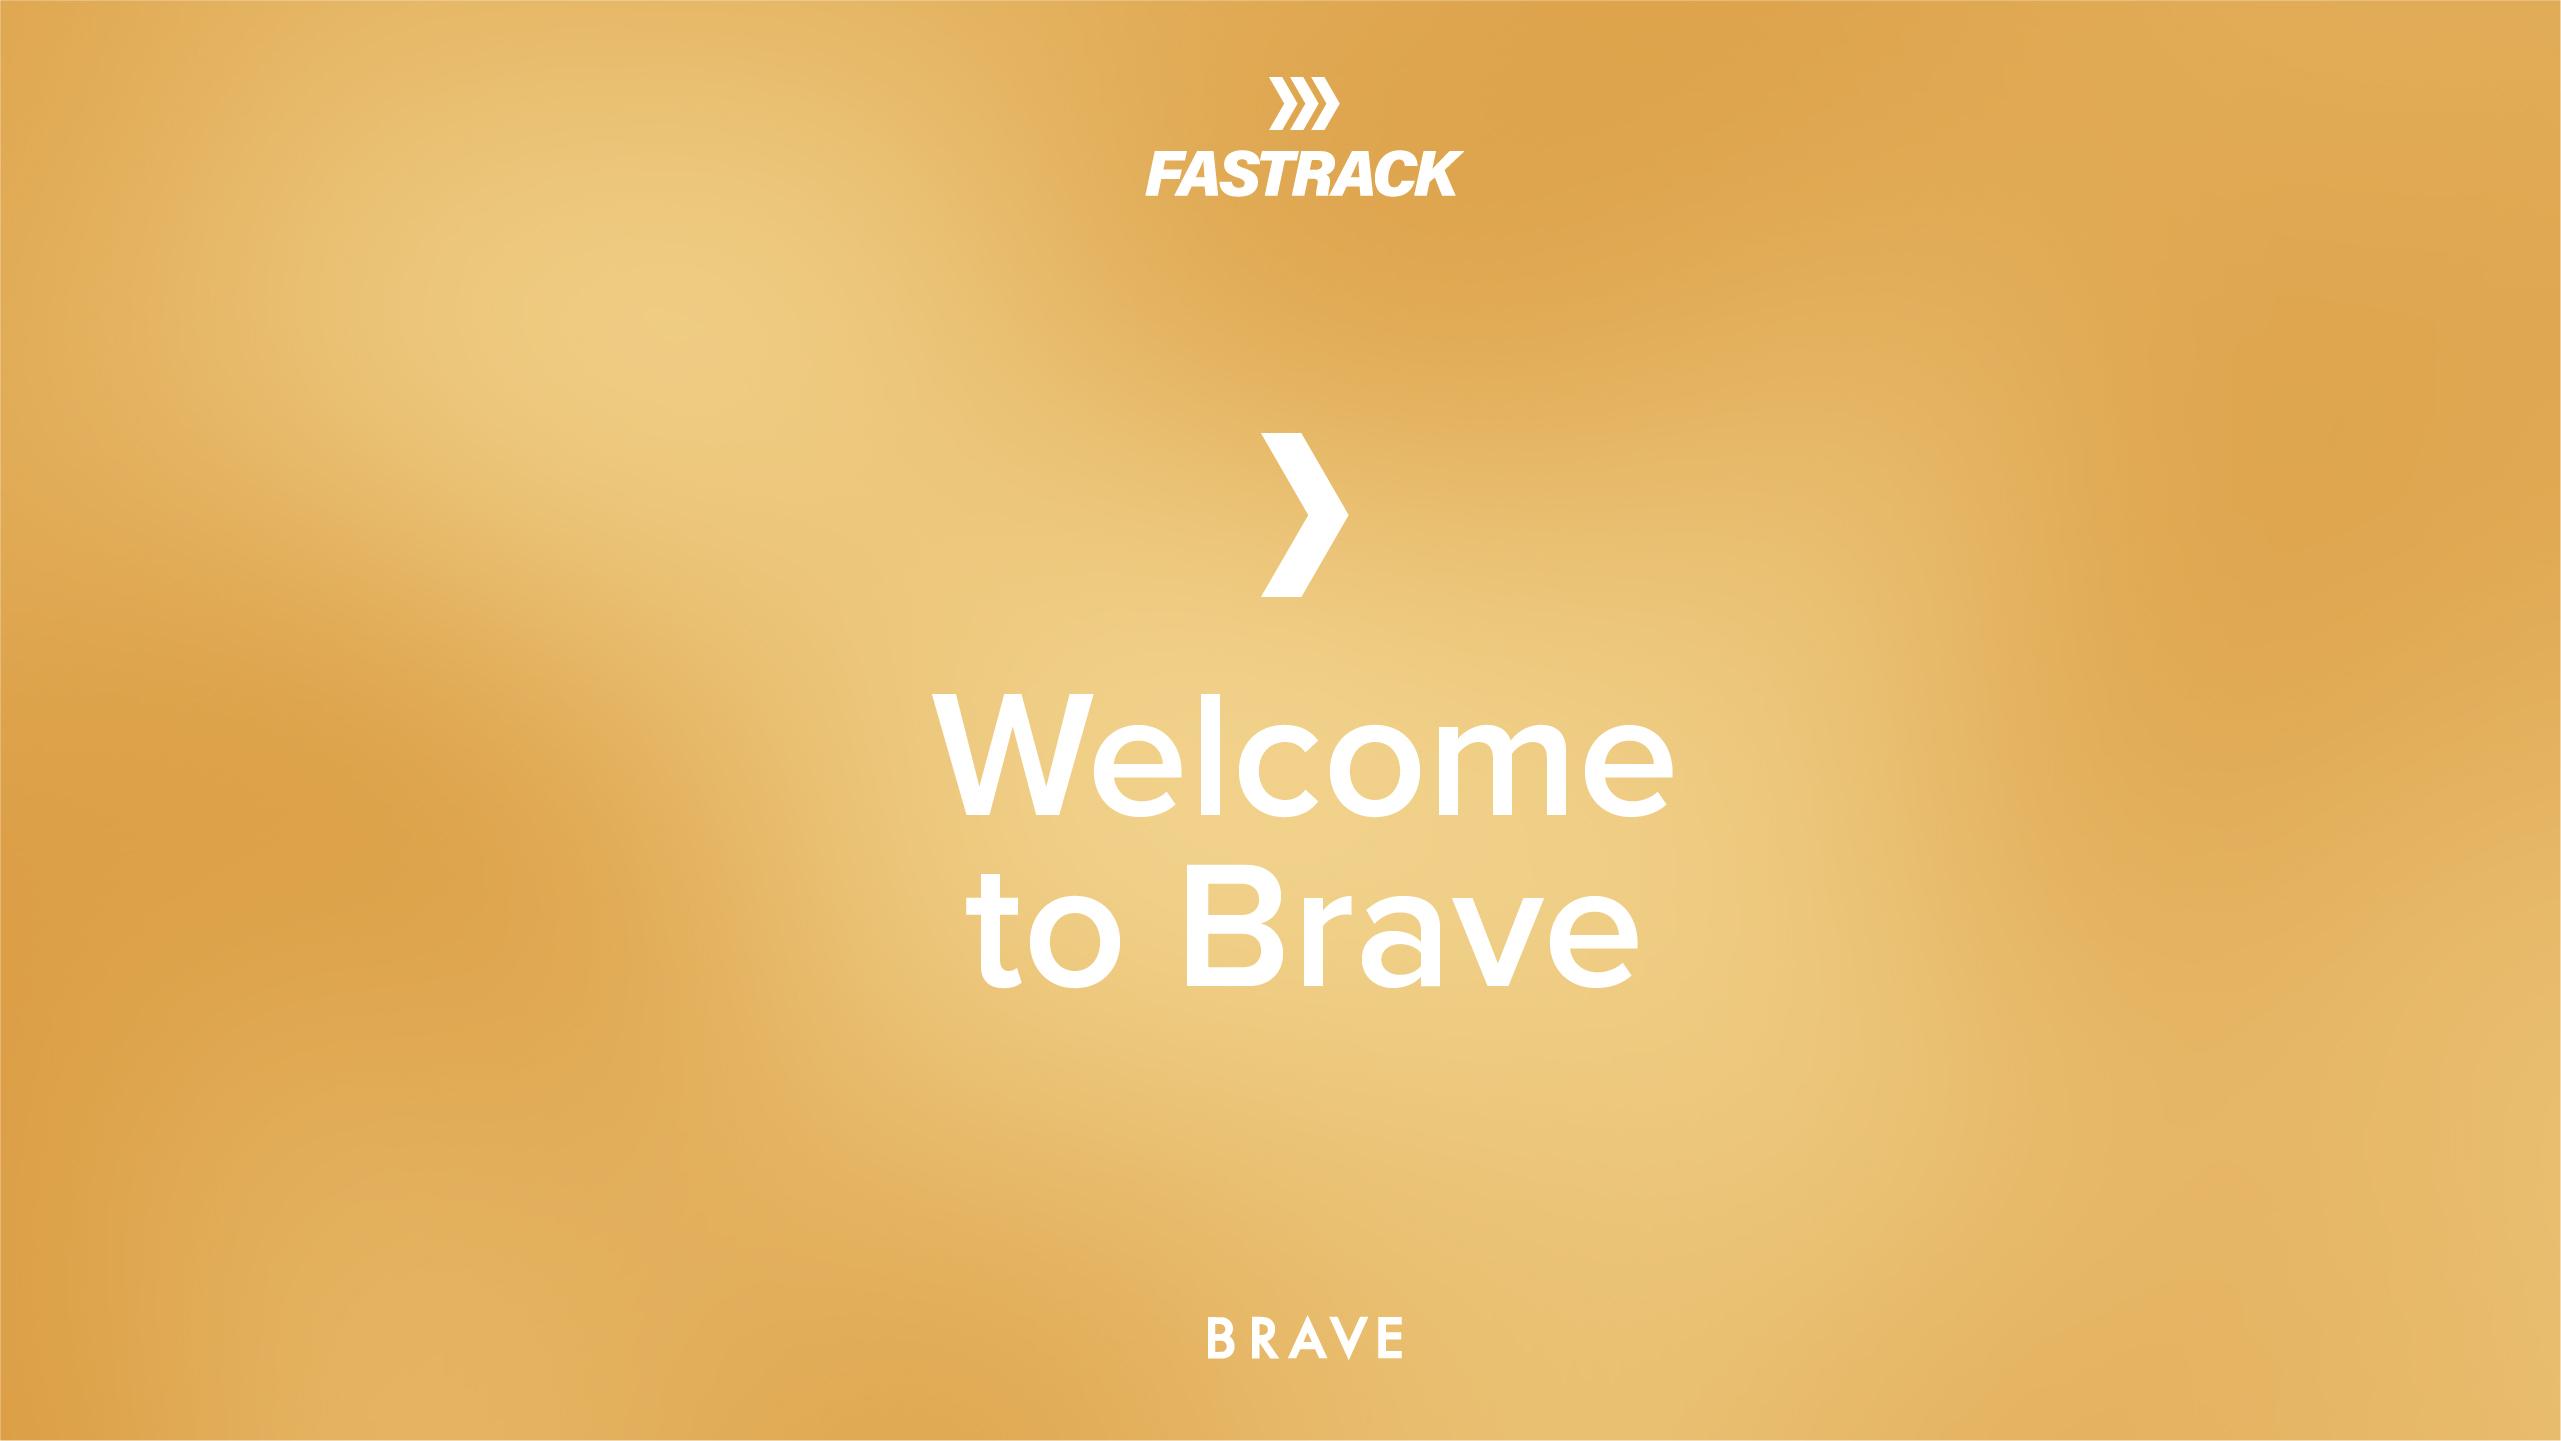 Welcomefasttrack